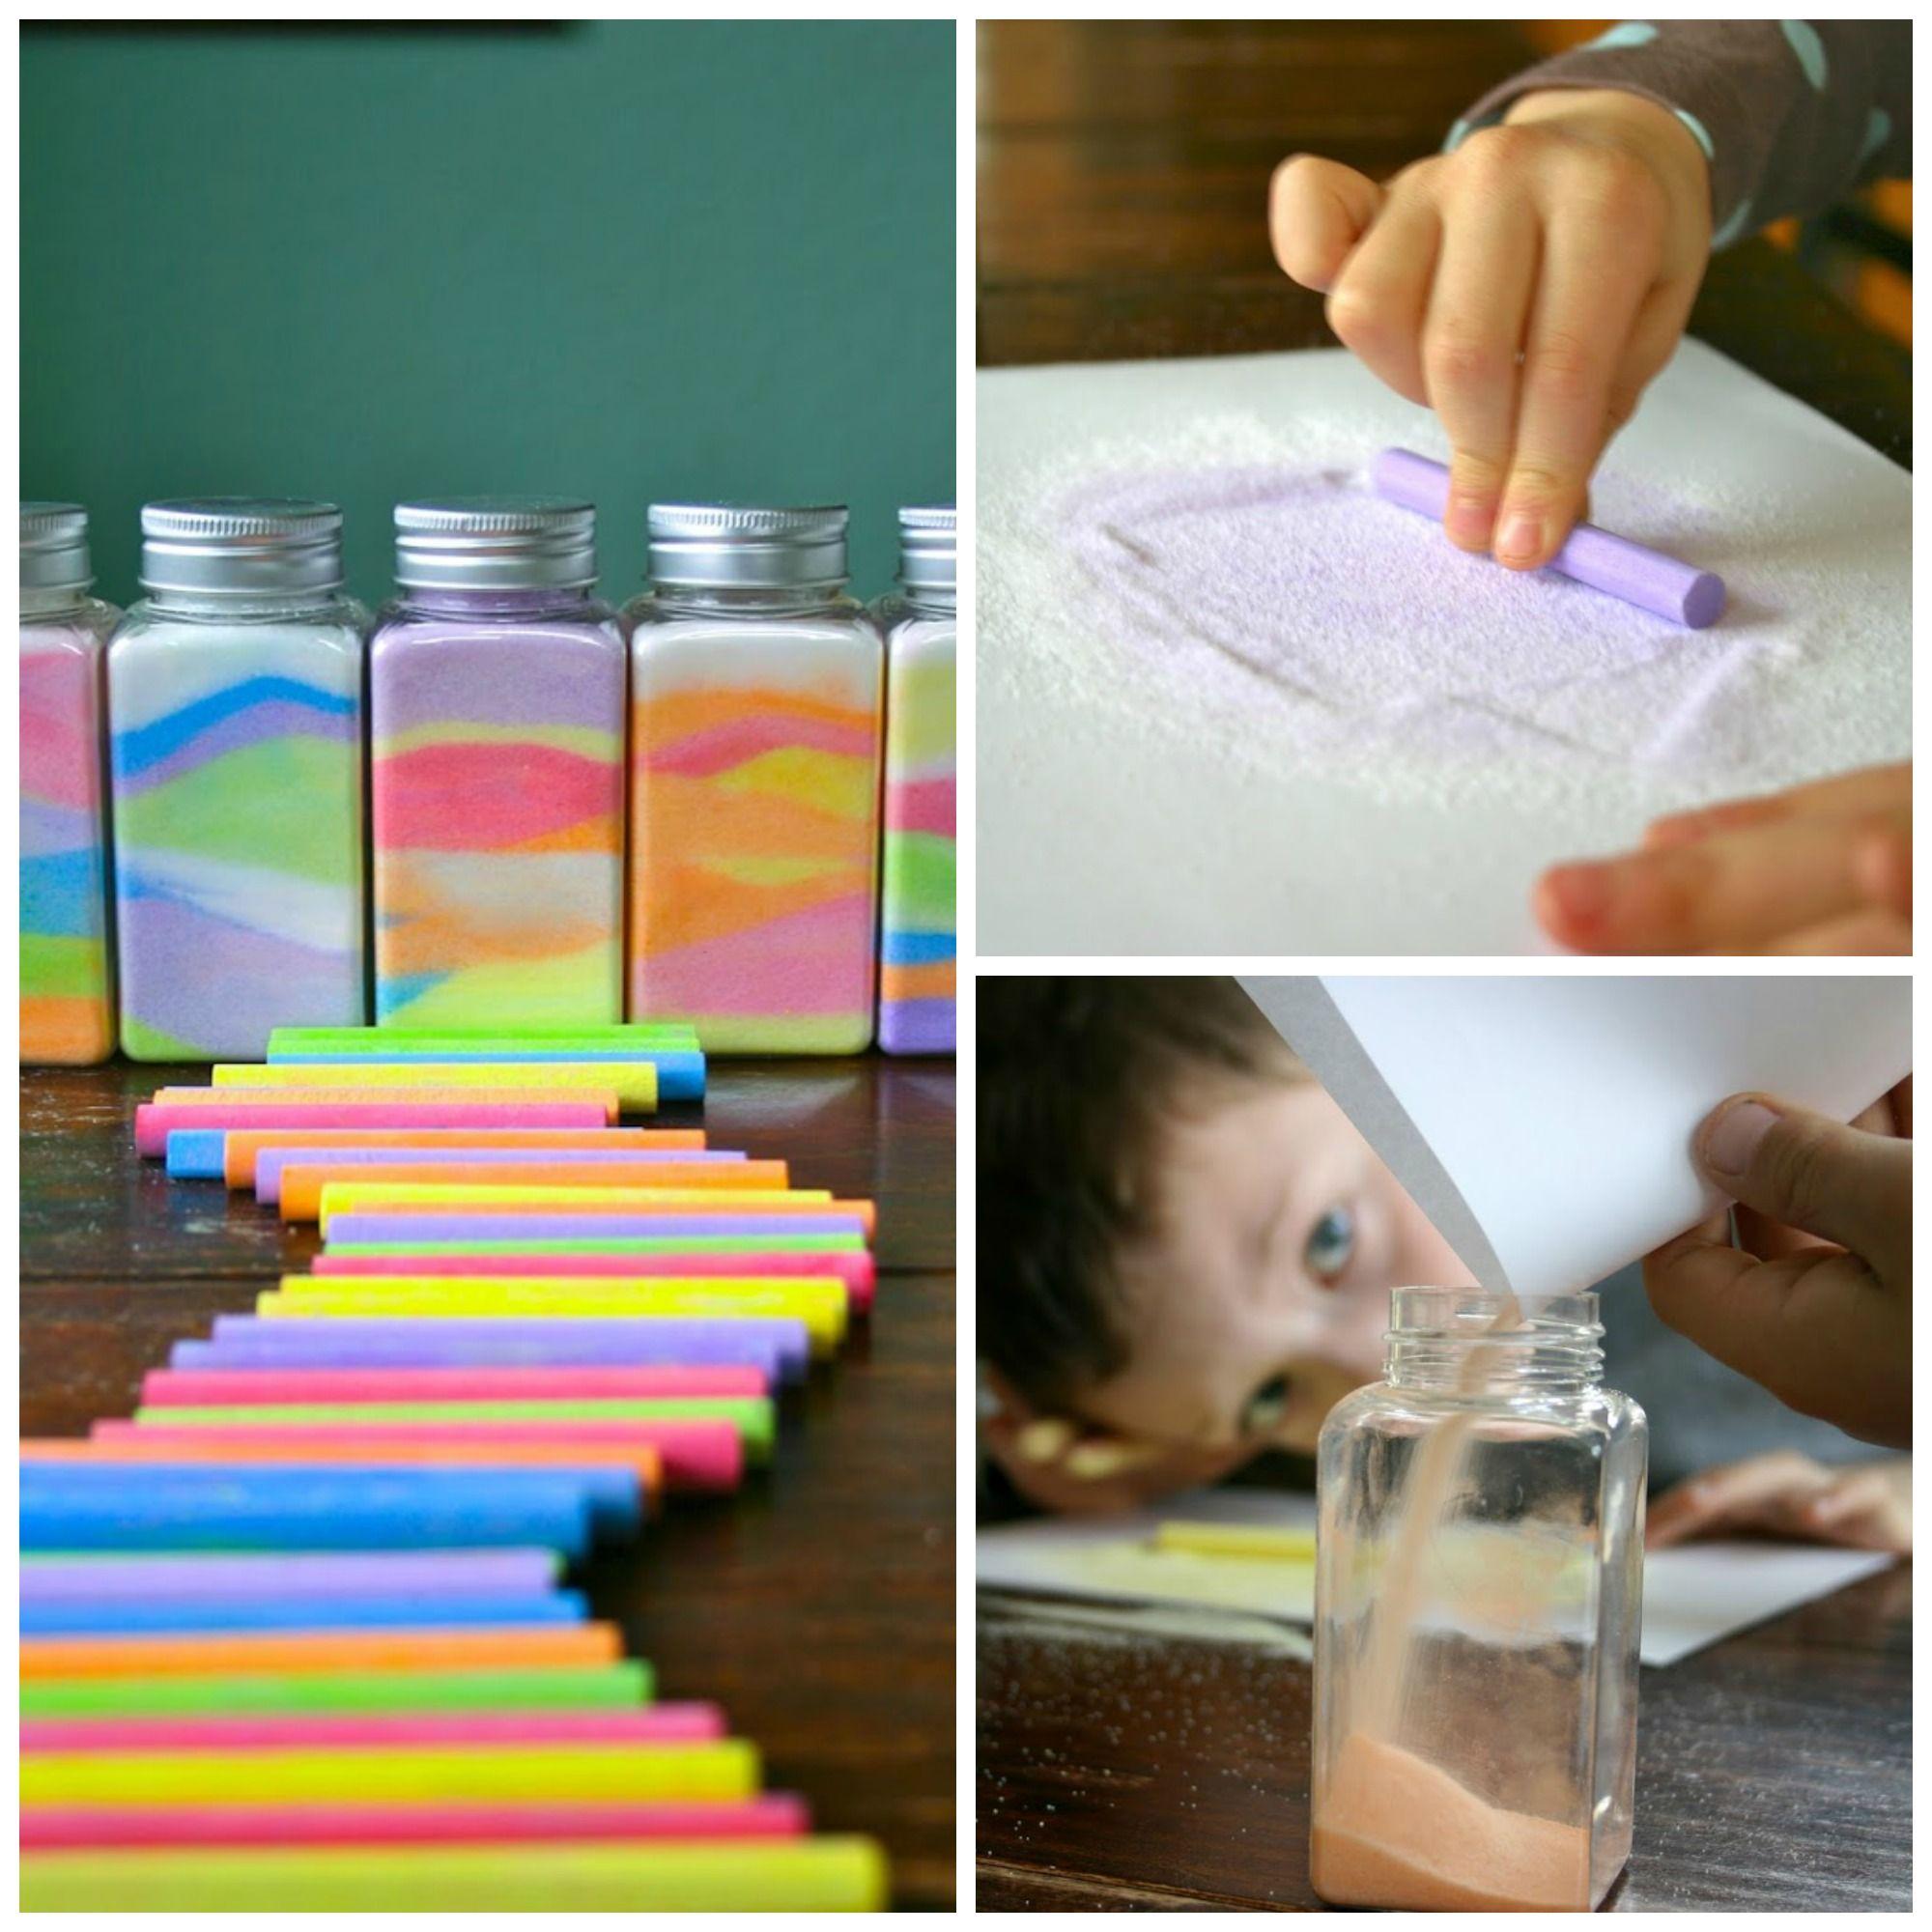 Rainbow In A Jar Beautiful Art For Kids Using Chalk And Salt Sunday School Crafts Crafts For Kids School Crafts [ 2000 x 2000 Pixel ]